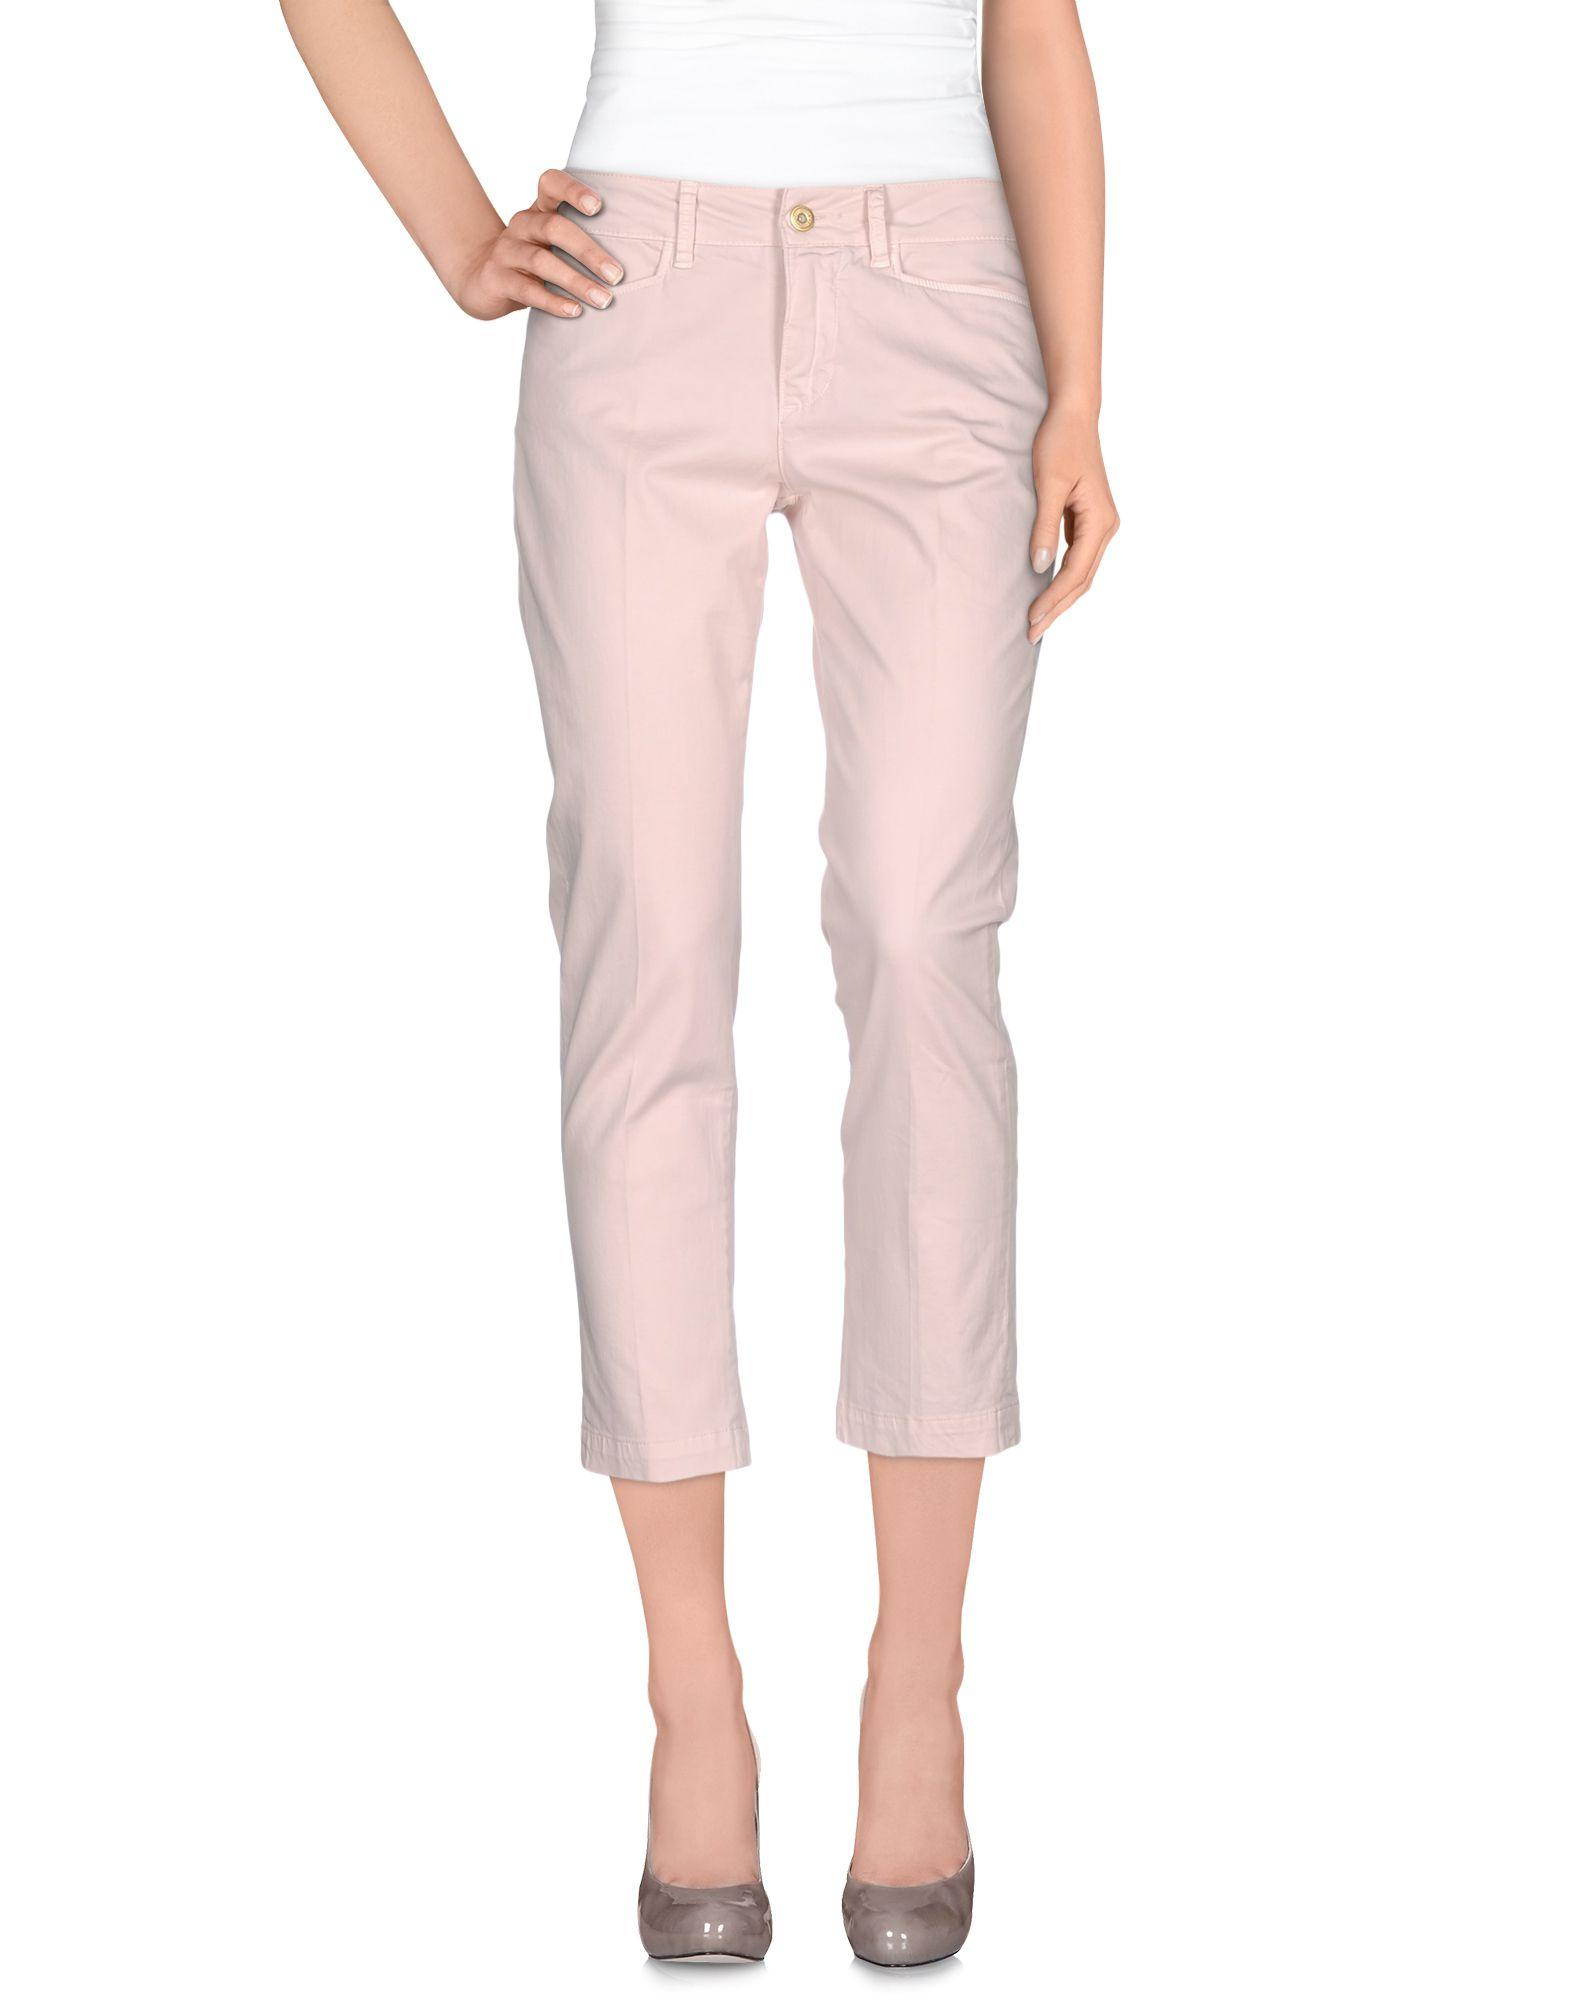 SHAFT DELUXE Damen Hose Farbe Hellrosa Größe 8